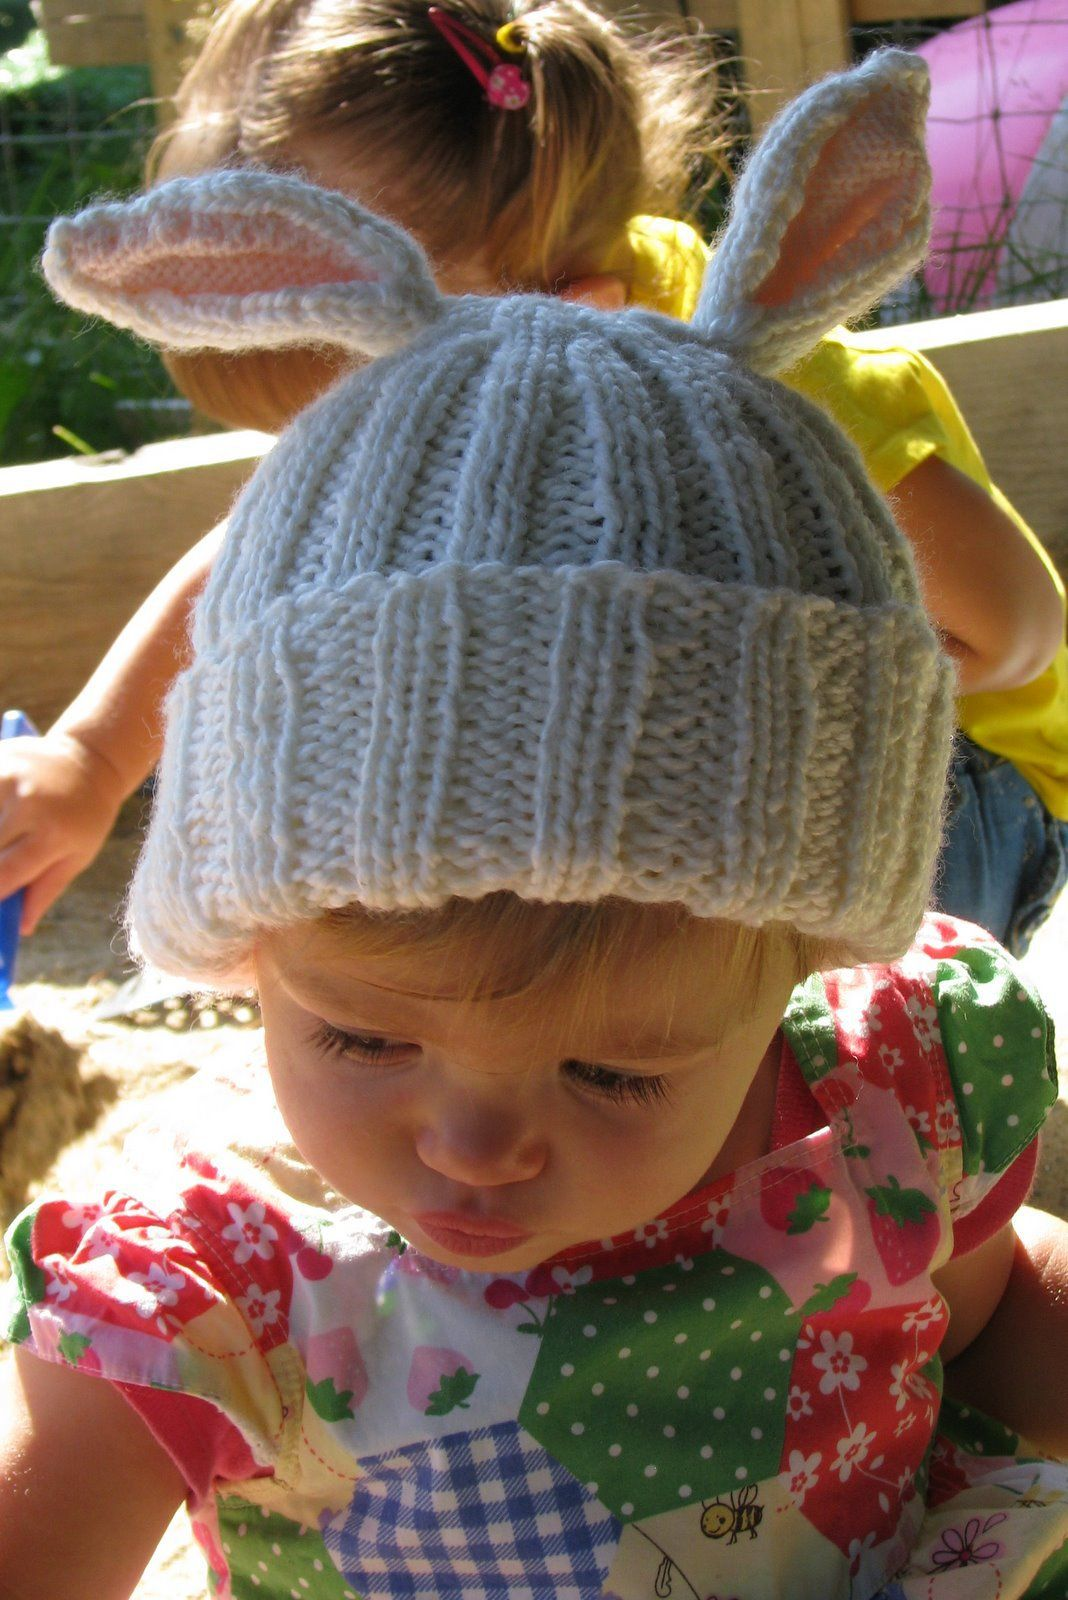 Bunny Rabbit Knitting Patterns | Ear hats, Knit patterns and Bunny